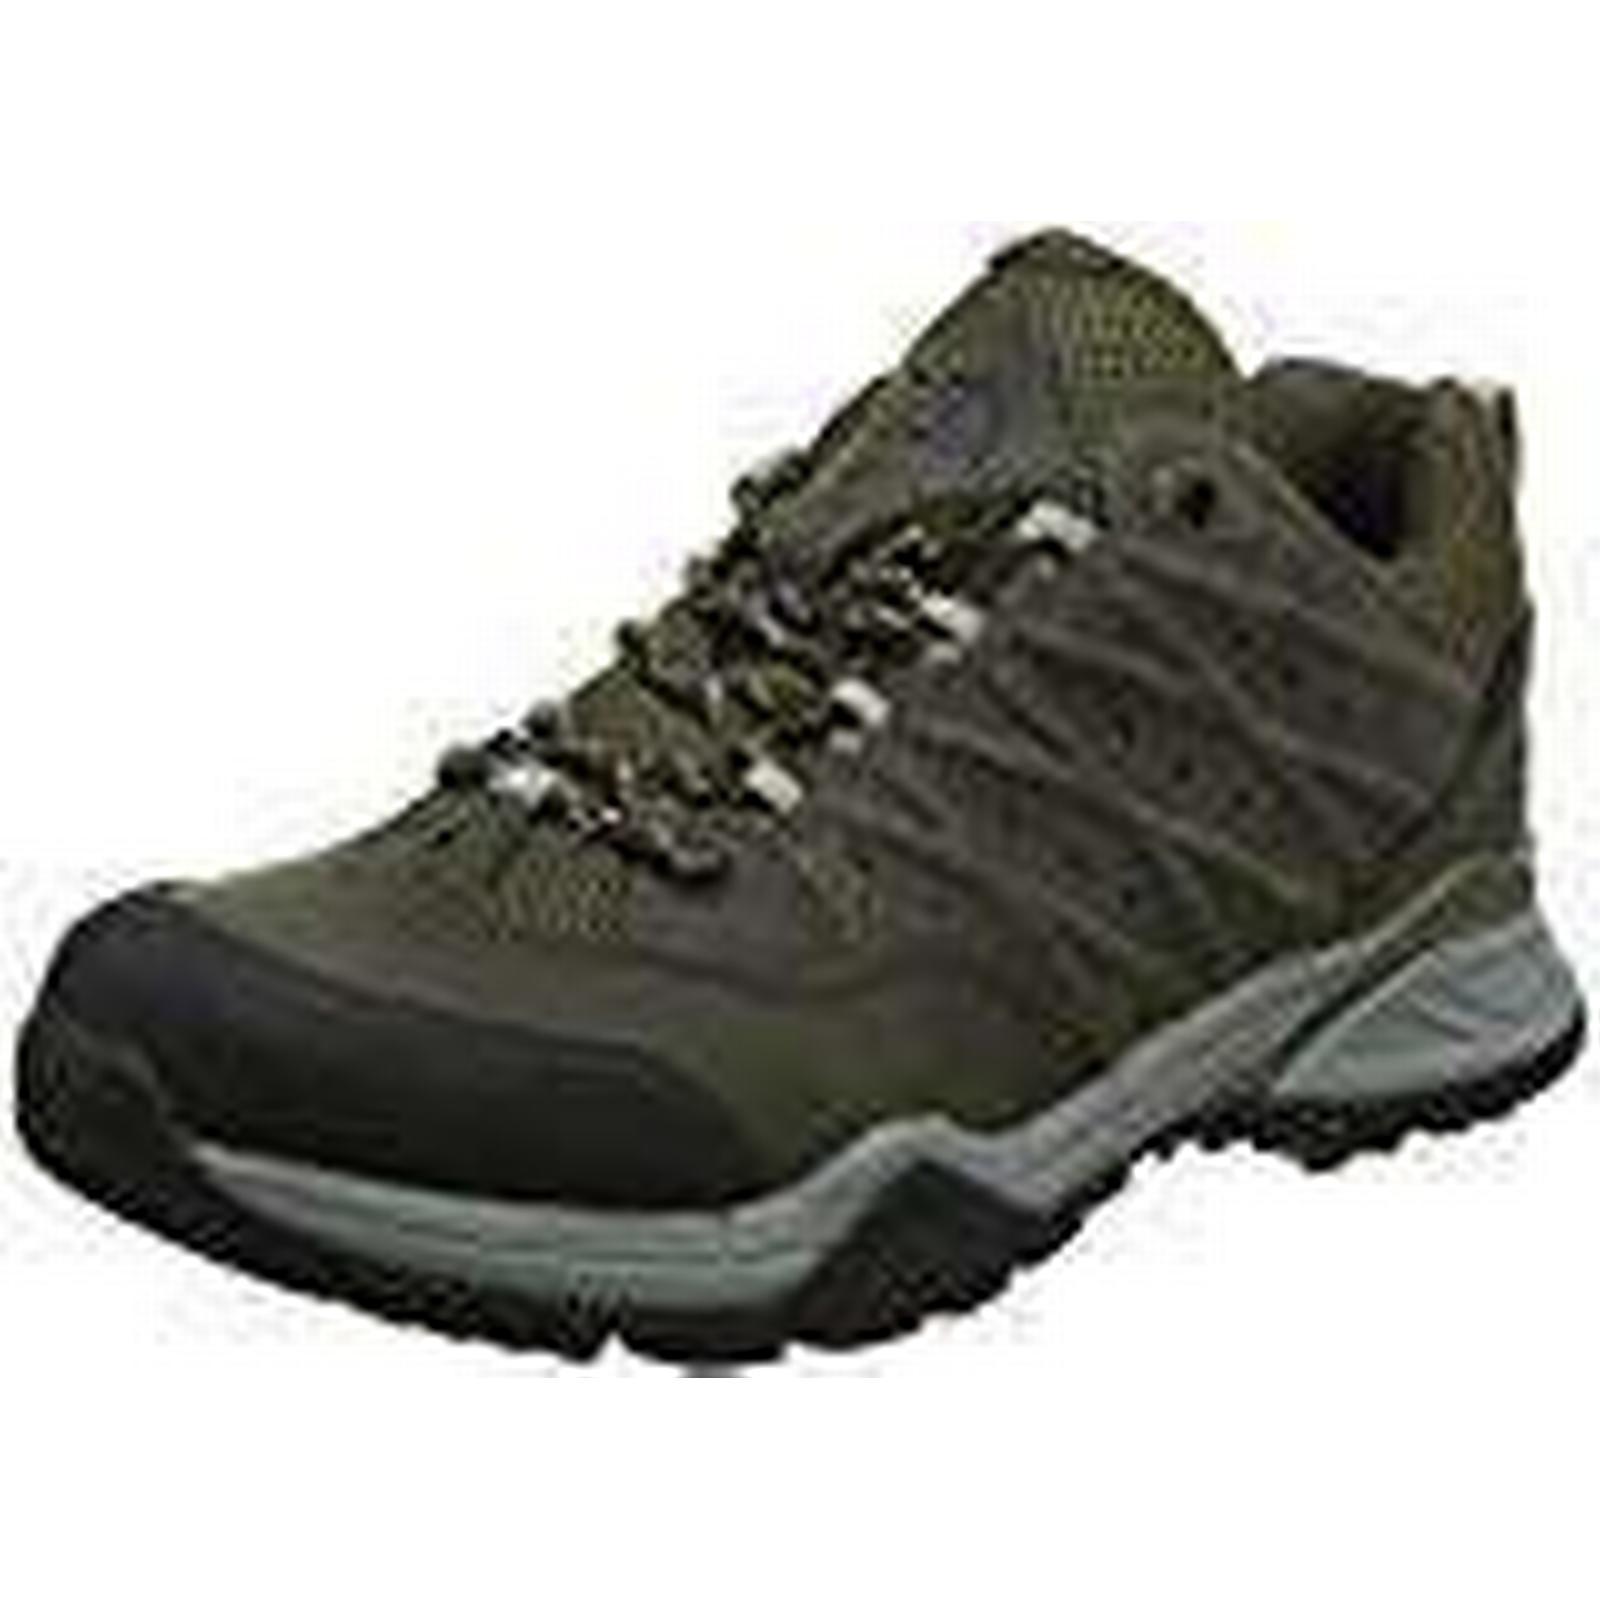 THE NORTH FACE Men's Hedgehog II Boots, GTX Low Rise Hiking Boots, II (Tarmac Burnt Olive Green 4dd), 10 (44.5 EU) 5ac137